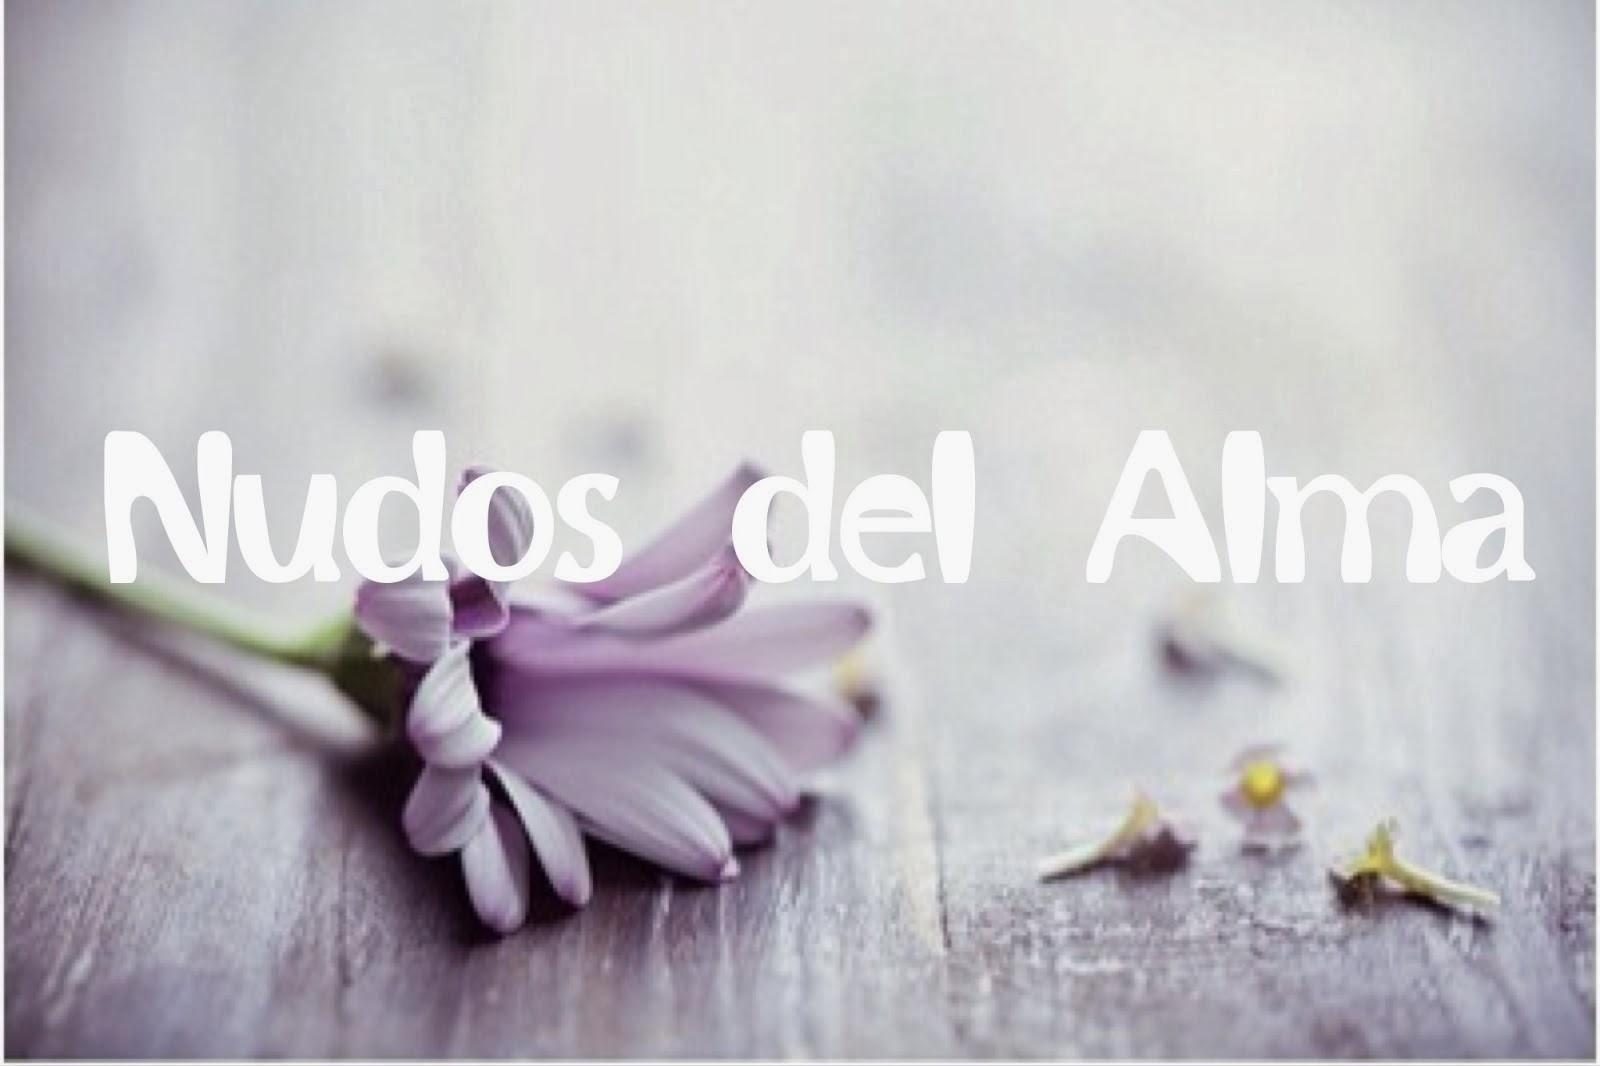 @floresenlaluna